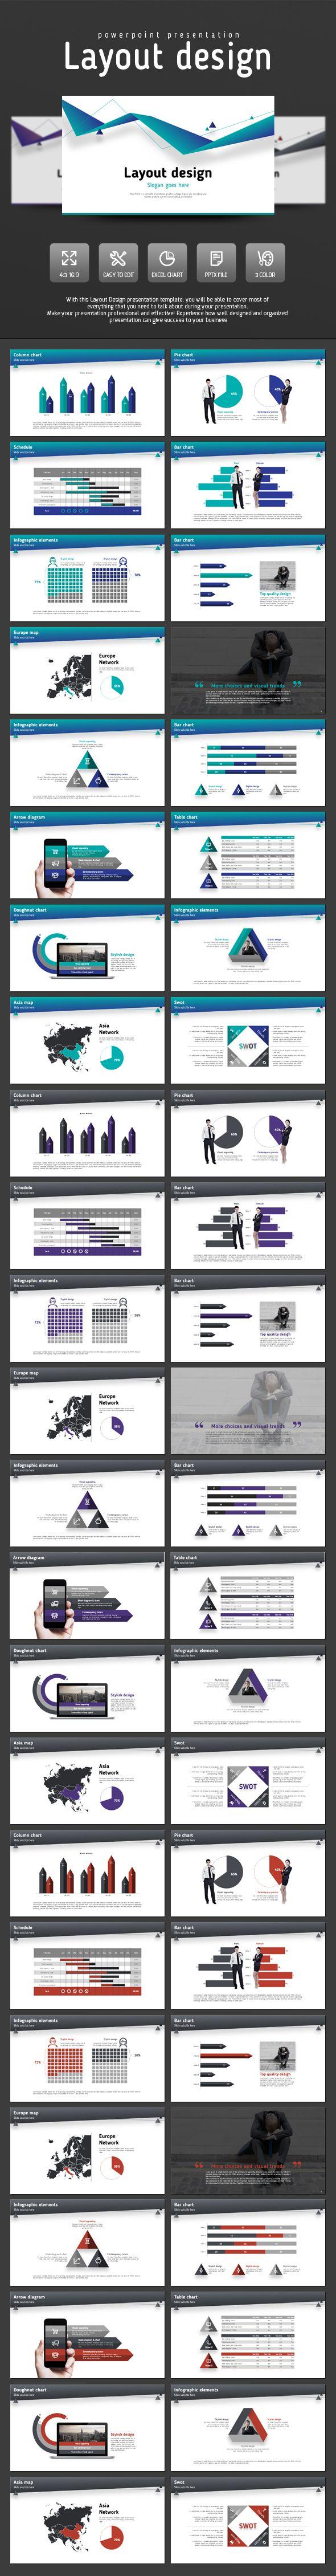 Layout Design PowerPoint Template #design #slides Download: http://graphicriver.net/item/layout-design/14033671?ref=ksioks